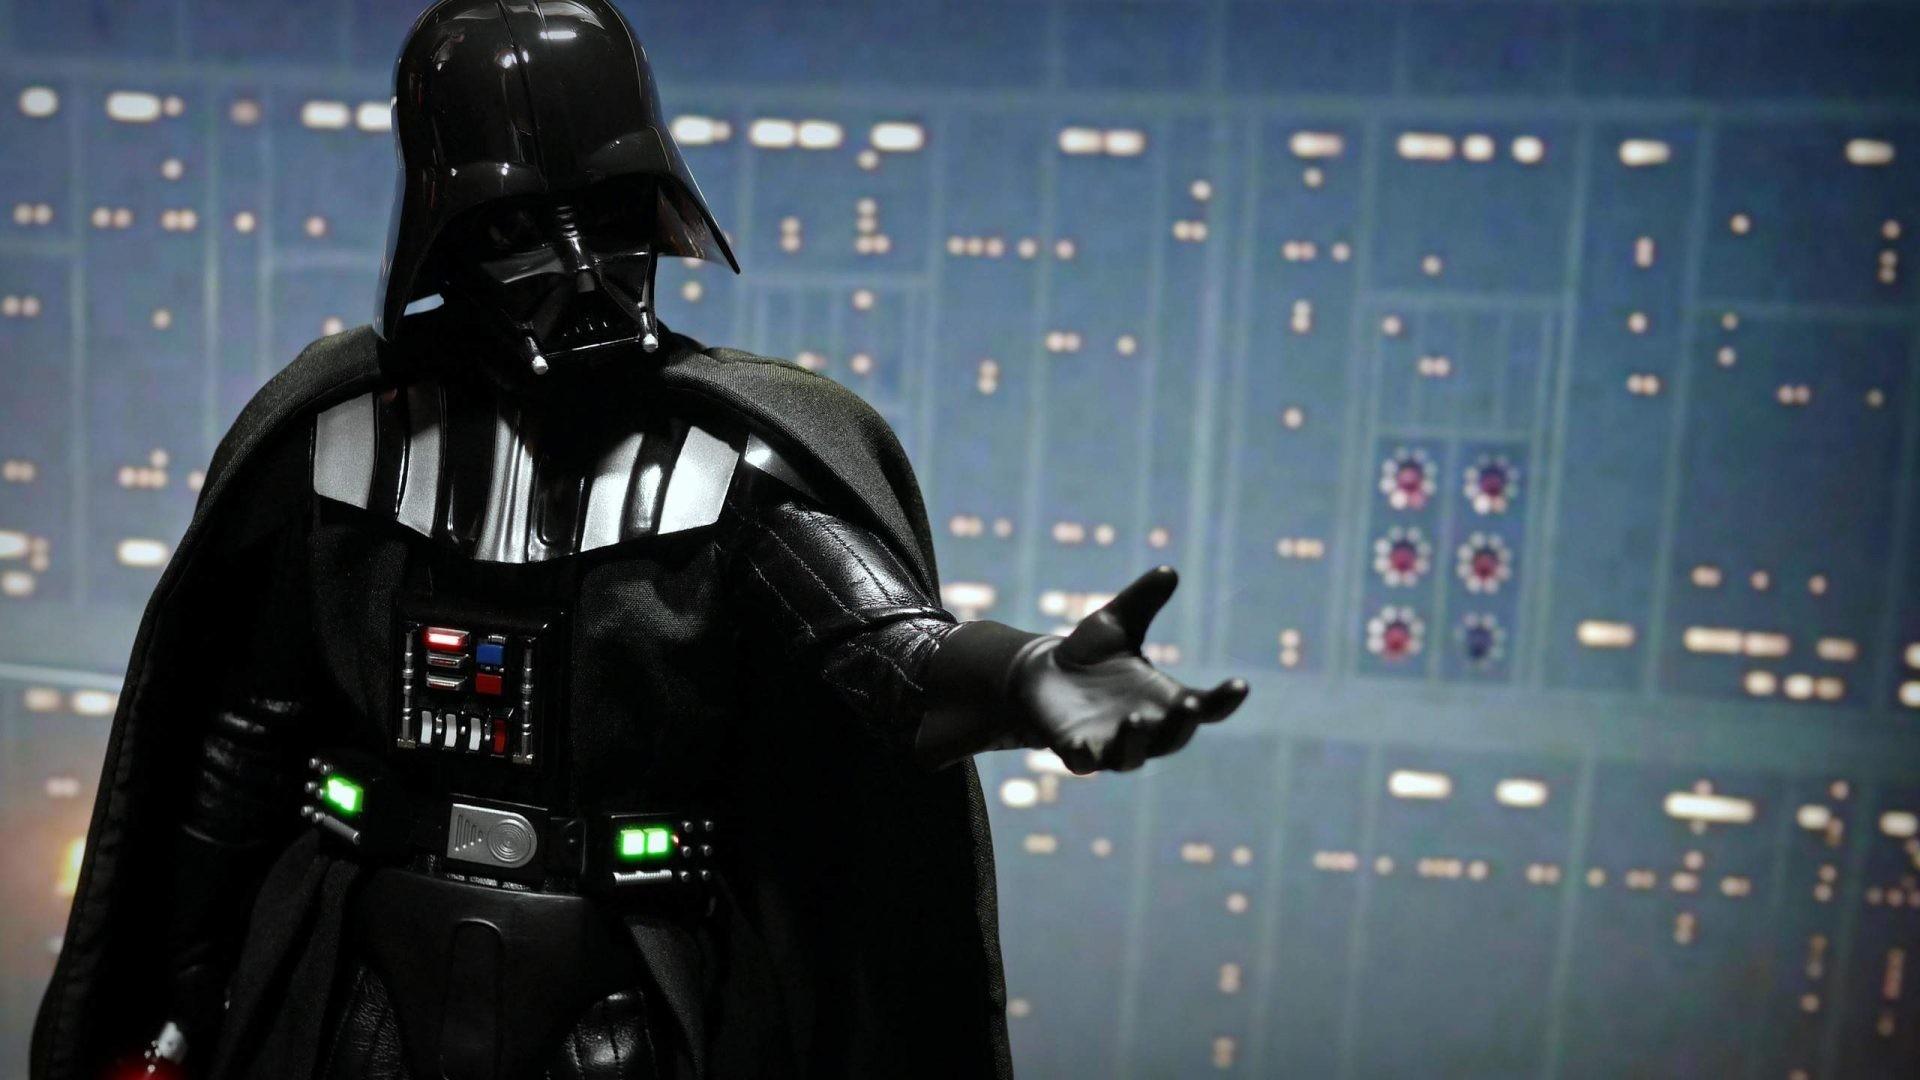 Star Wars Anakin Skywalker Wallpaper (75+ Images